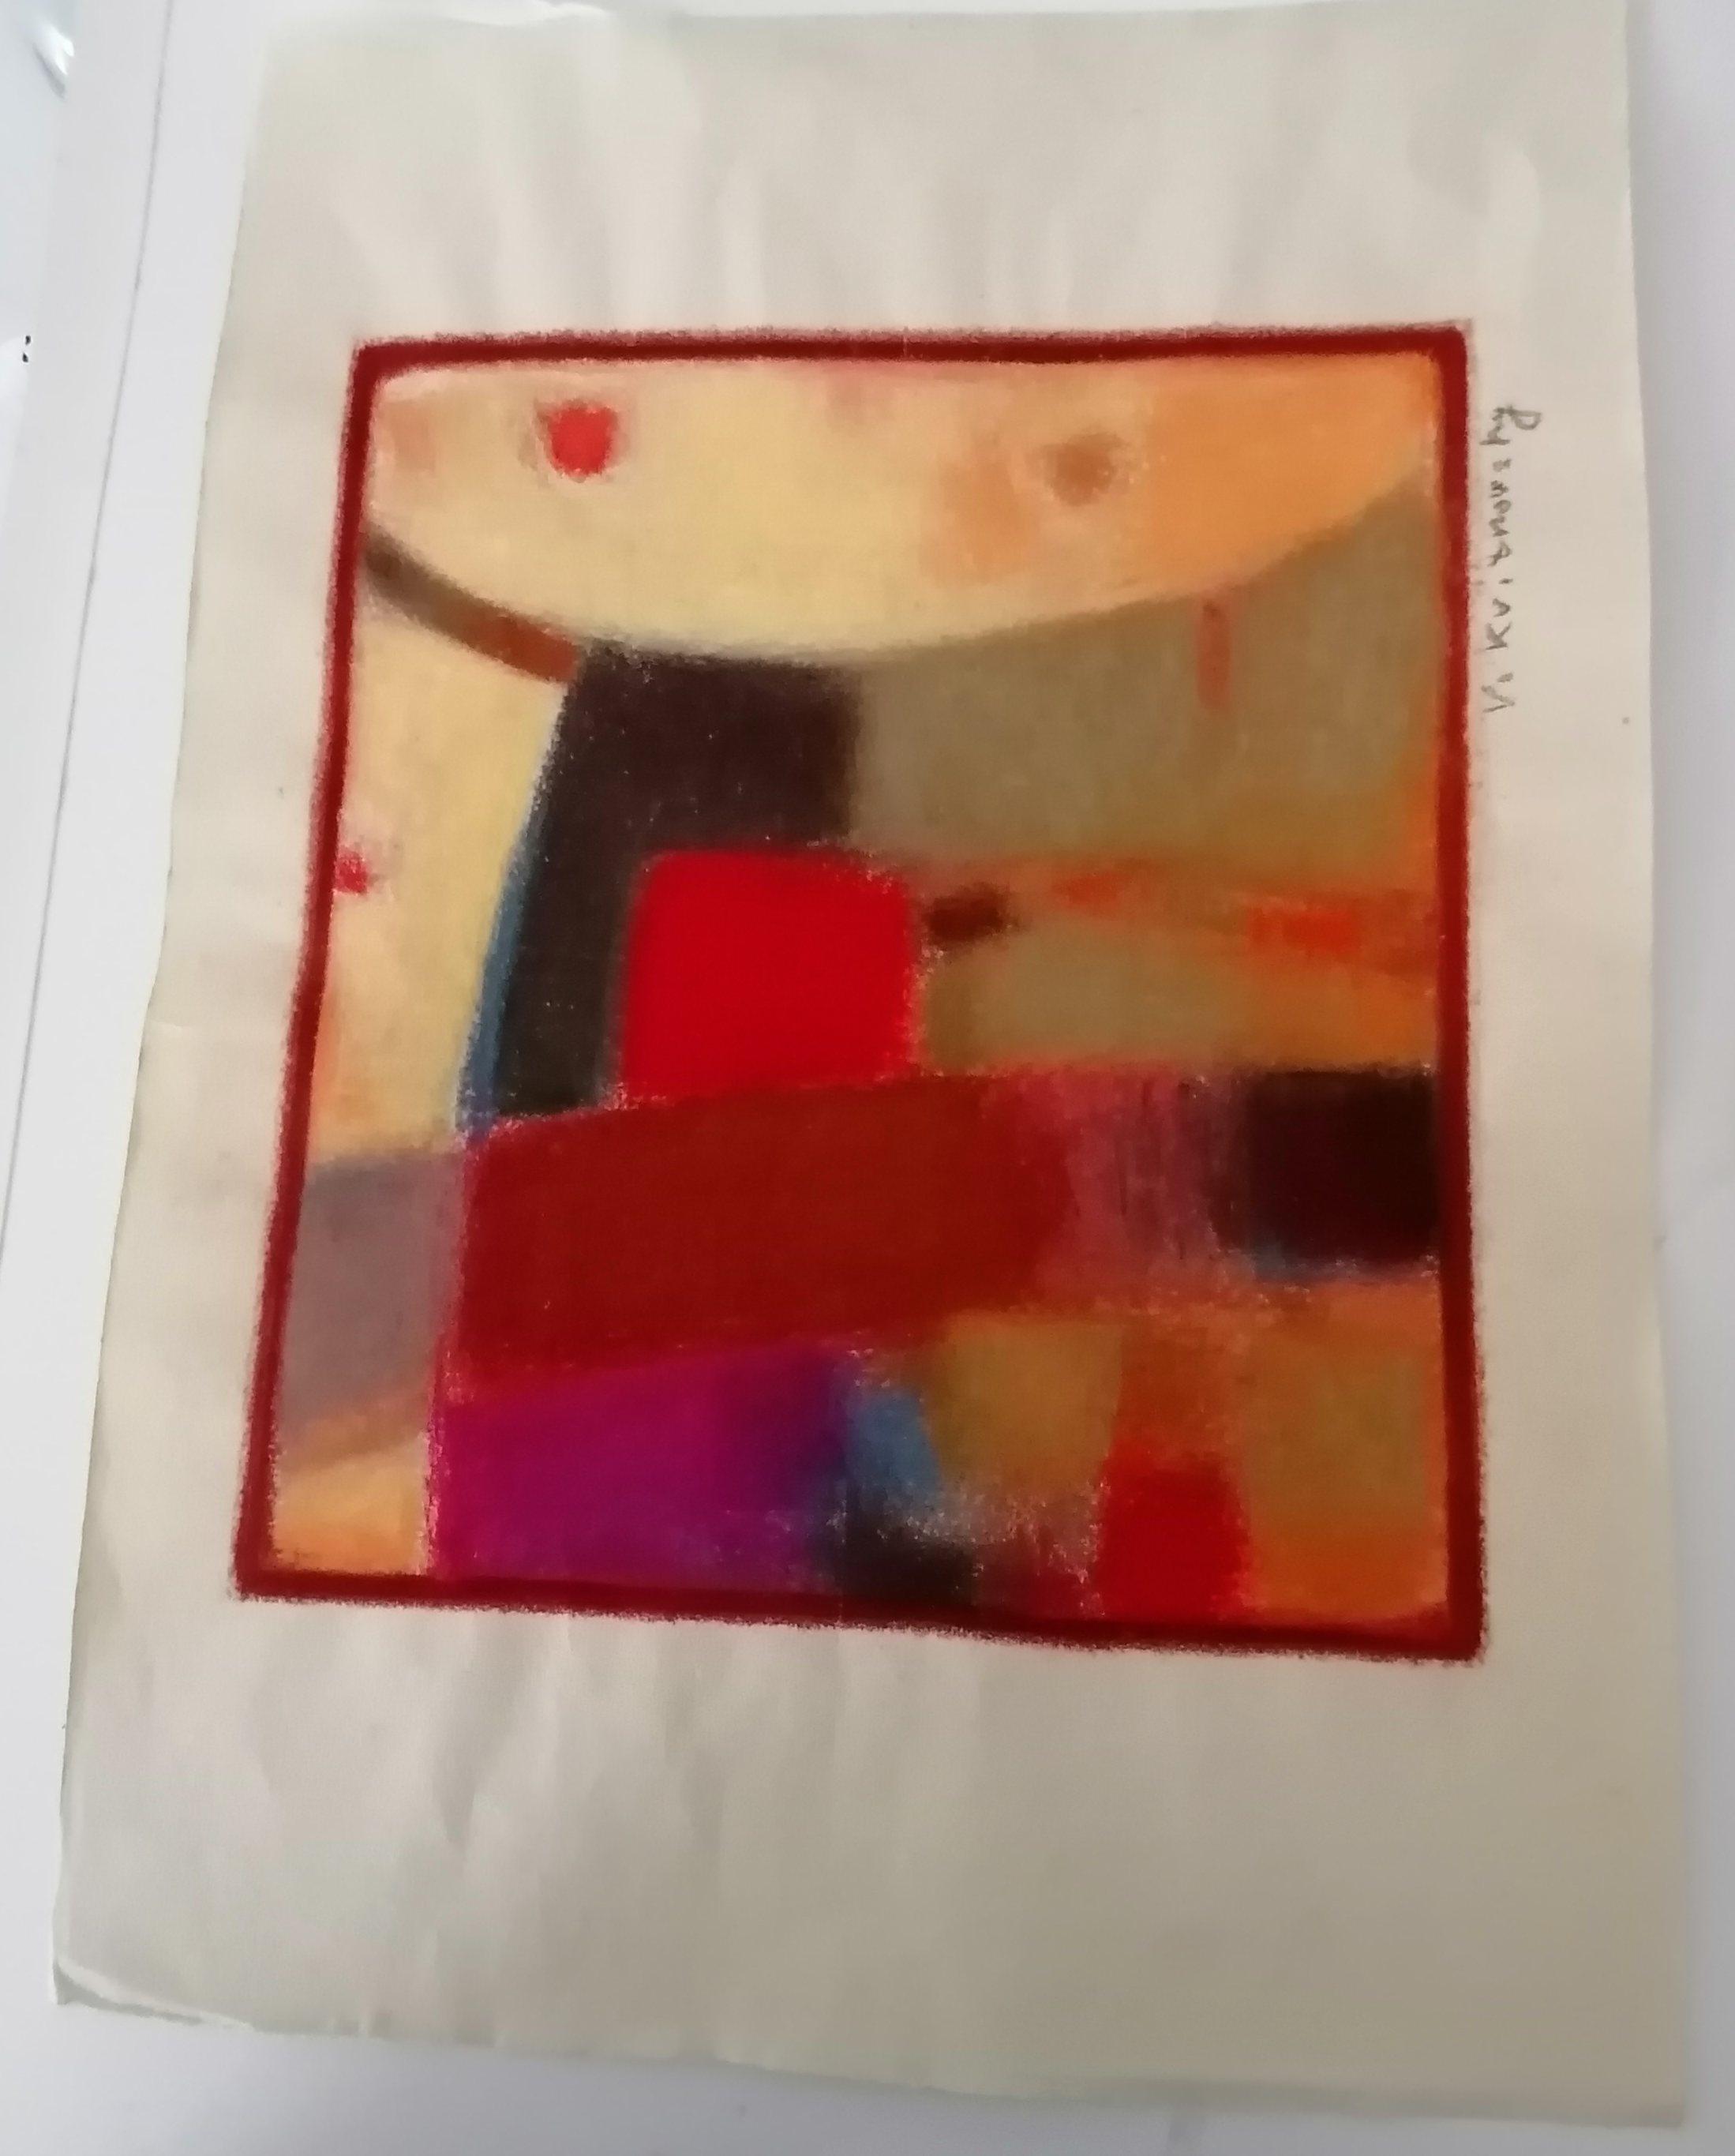 https://www.norstamps.com/content/images/stamps/gtgallerier/162.jpg